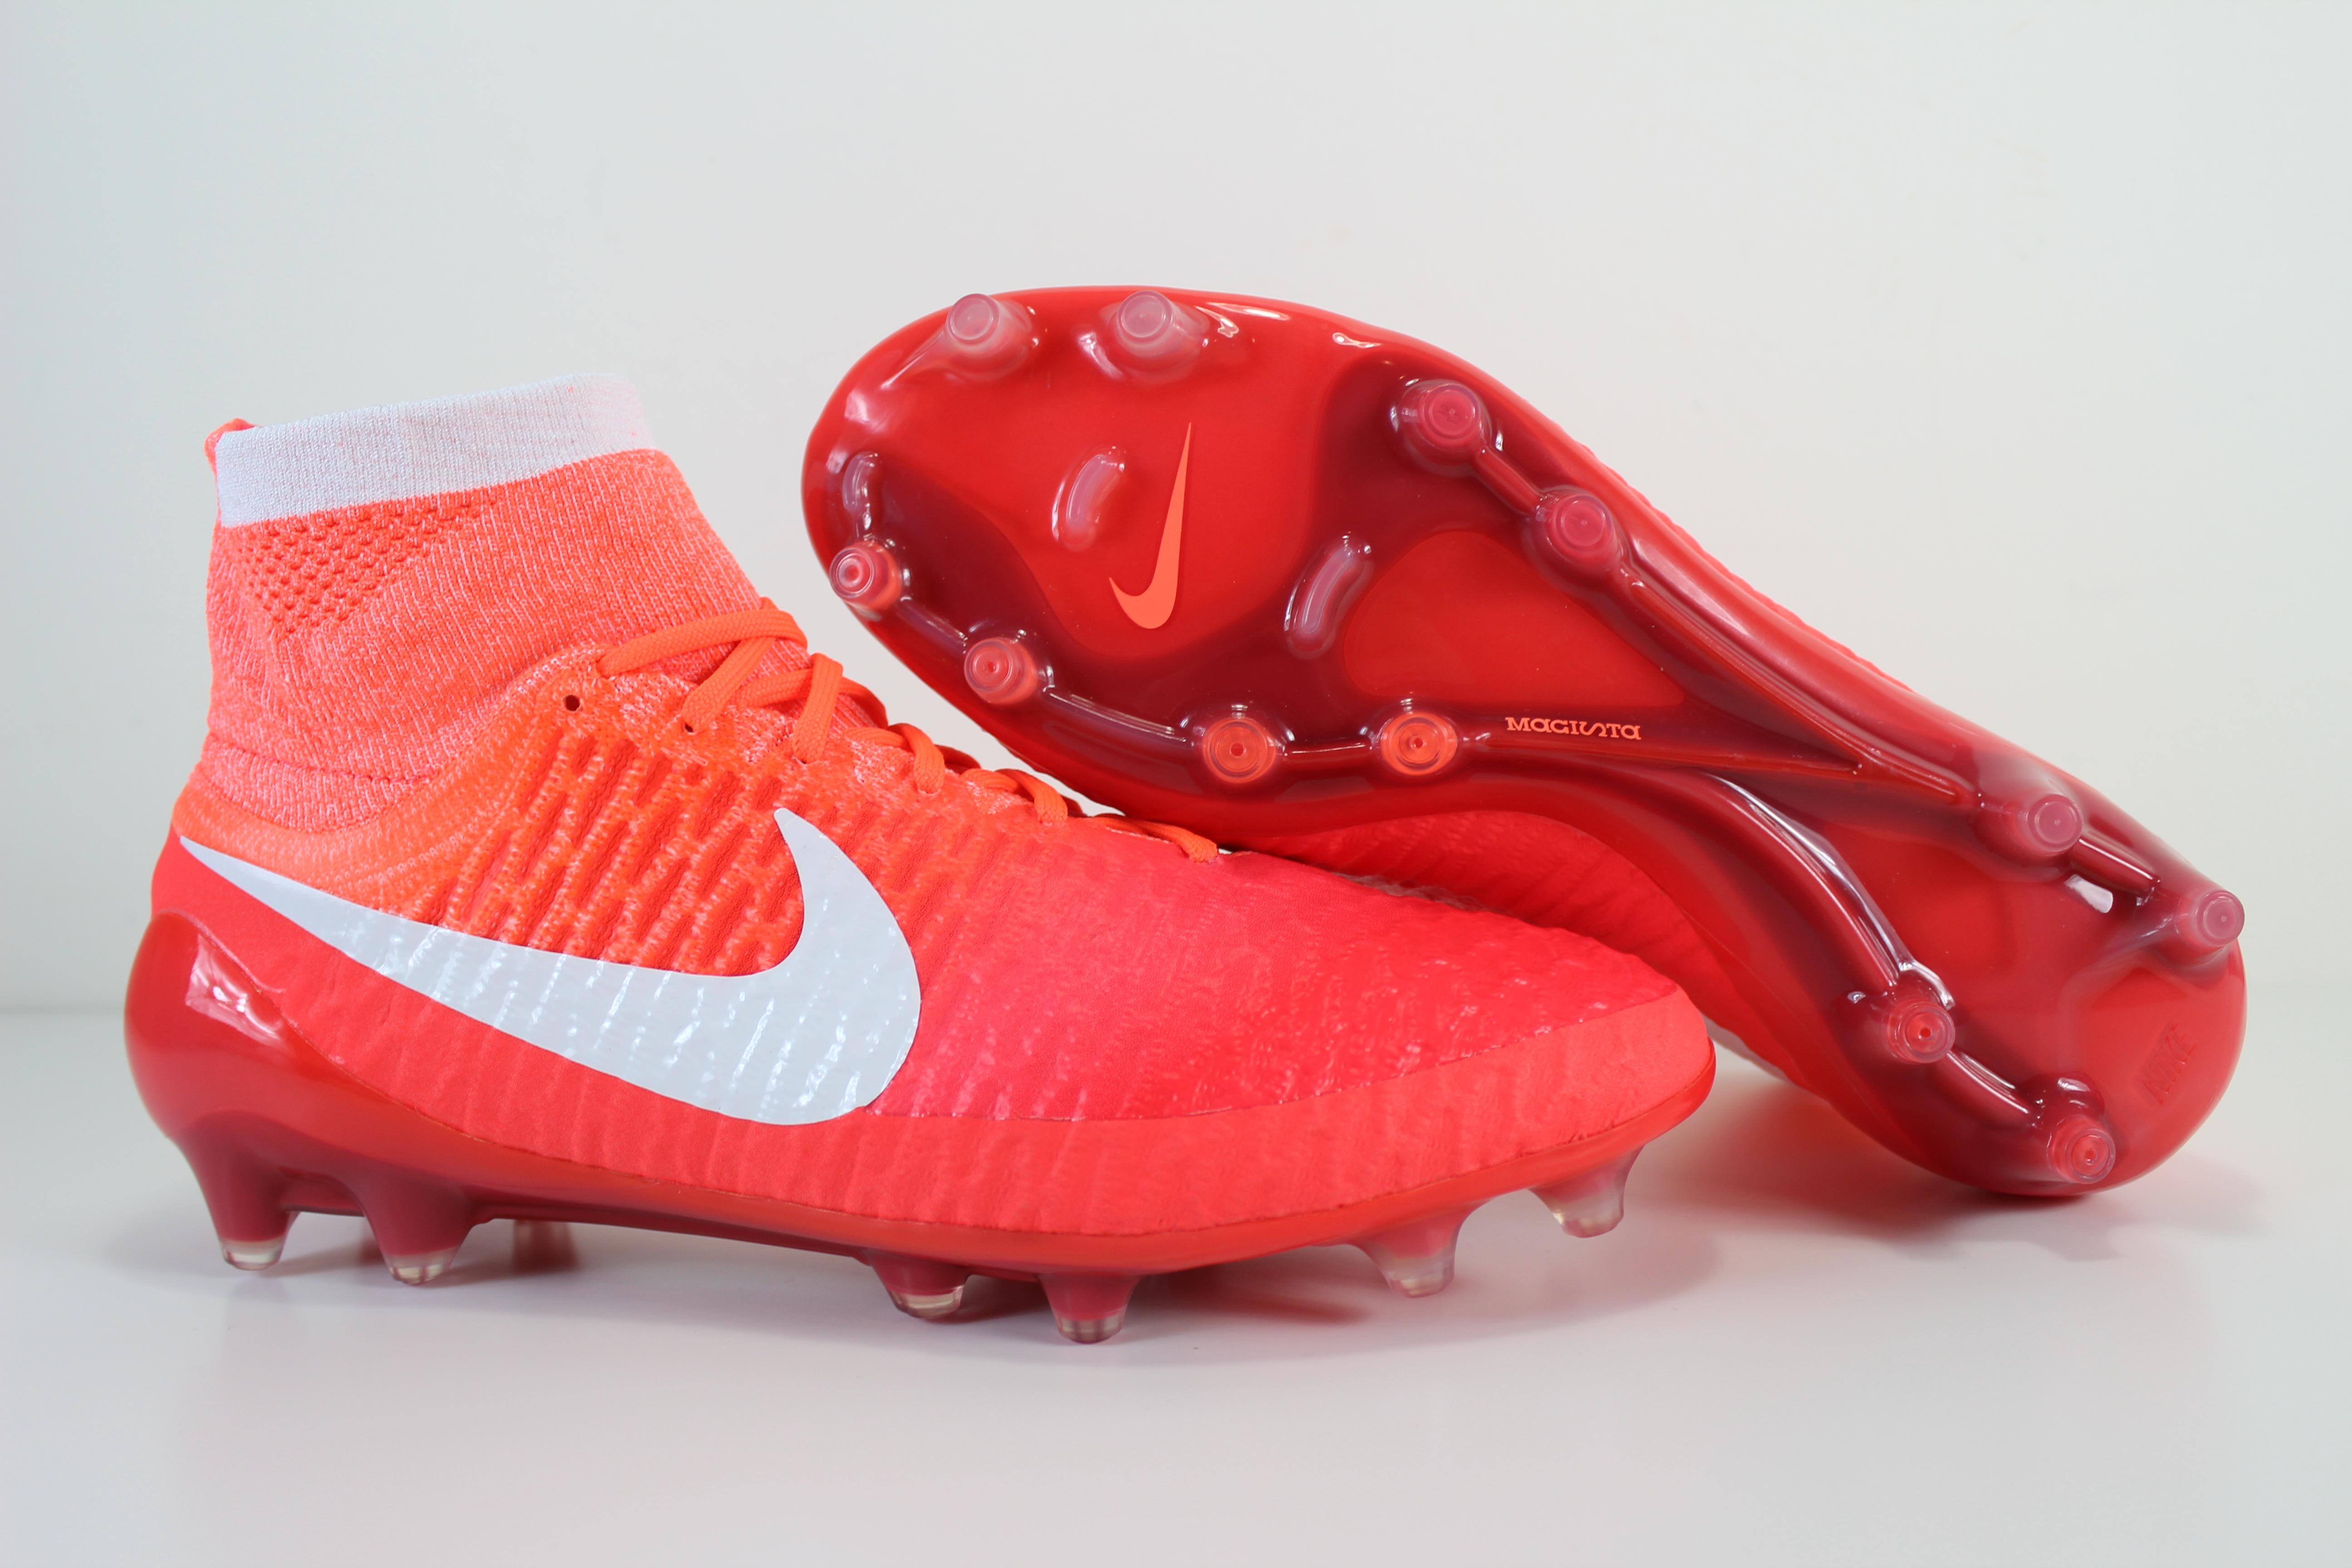 d3cca3210078 Nike Women s Magista Obra Review - Soccer Reviews For You